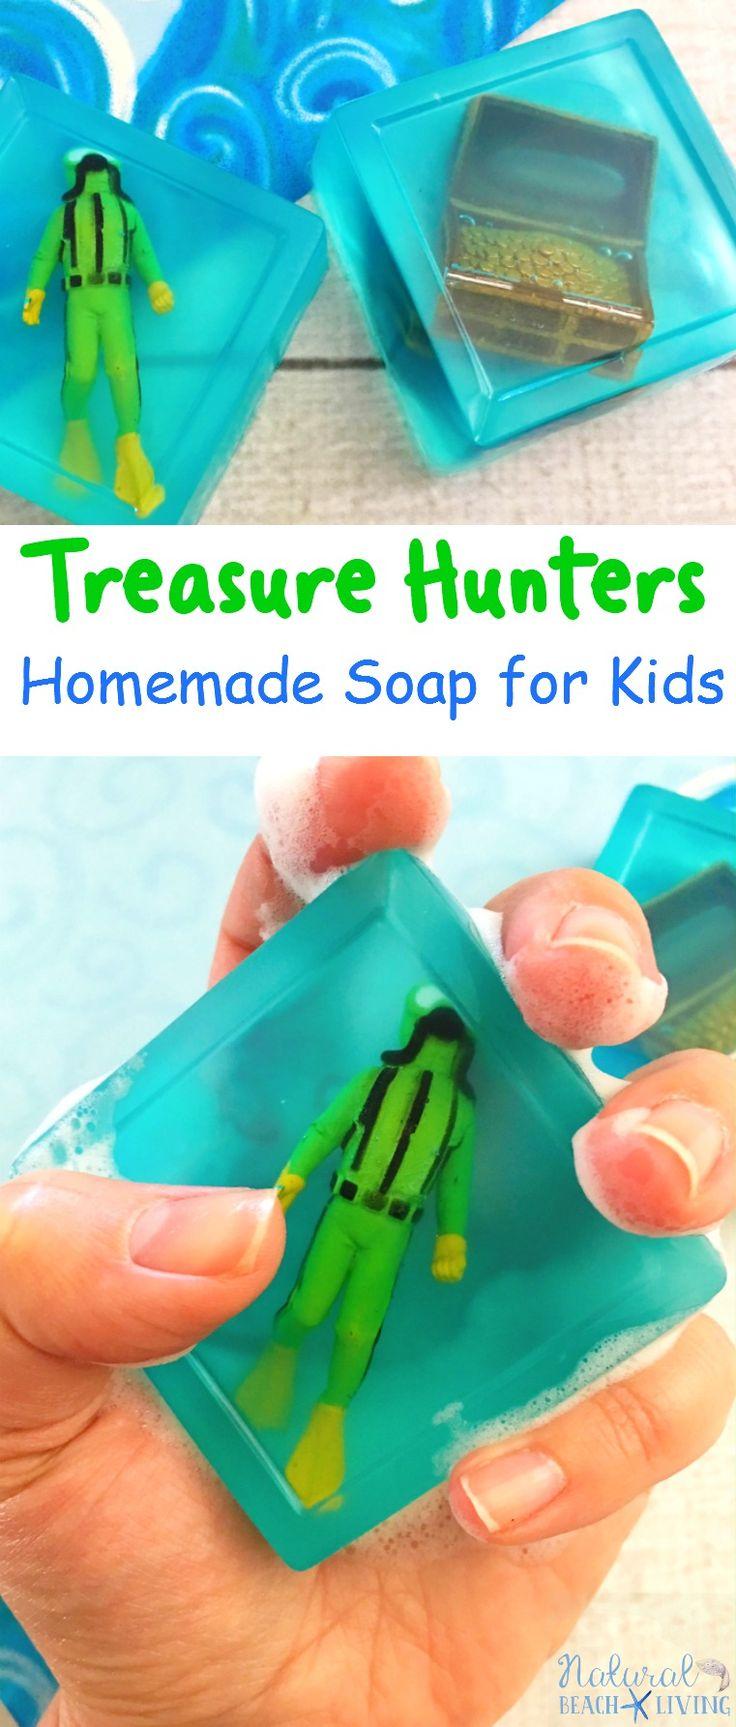 Treasure Themed Recipe Homemade Soap for Kids, Easy Homemade Soap Recipe for Kids,